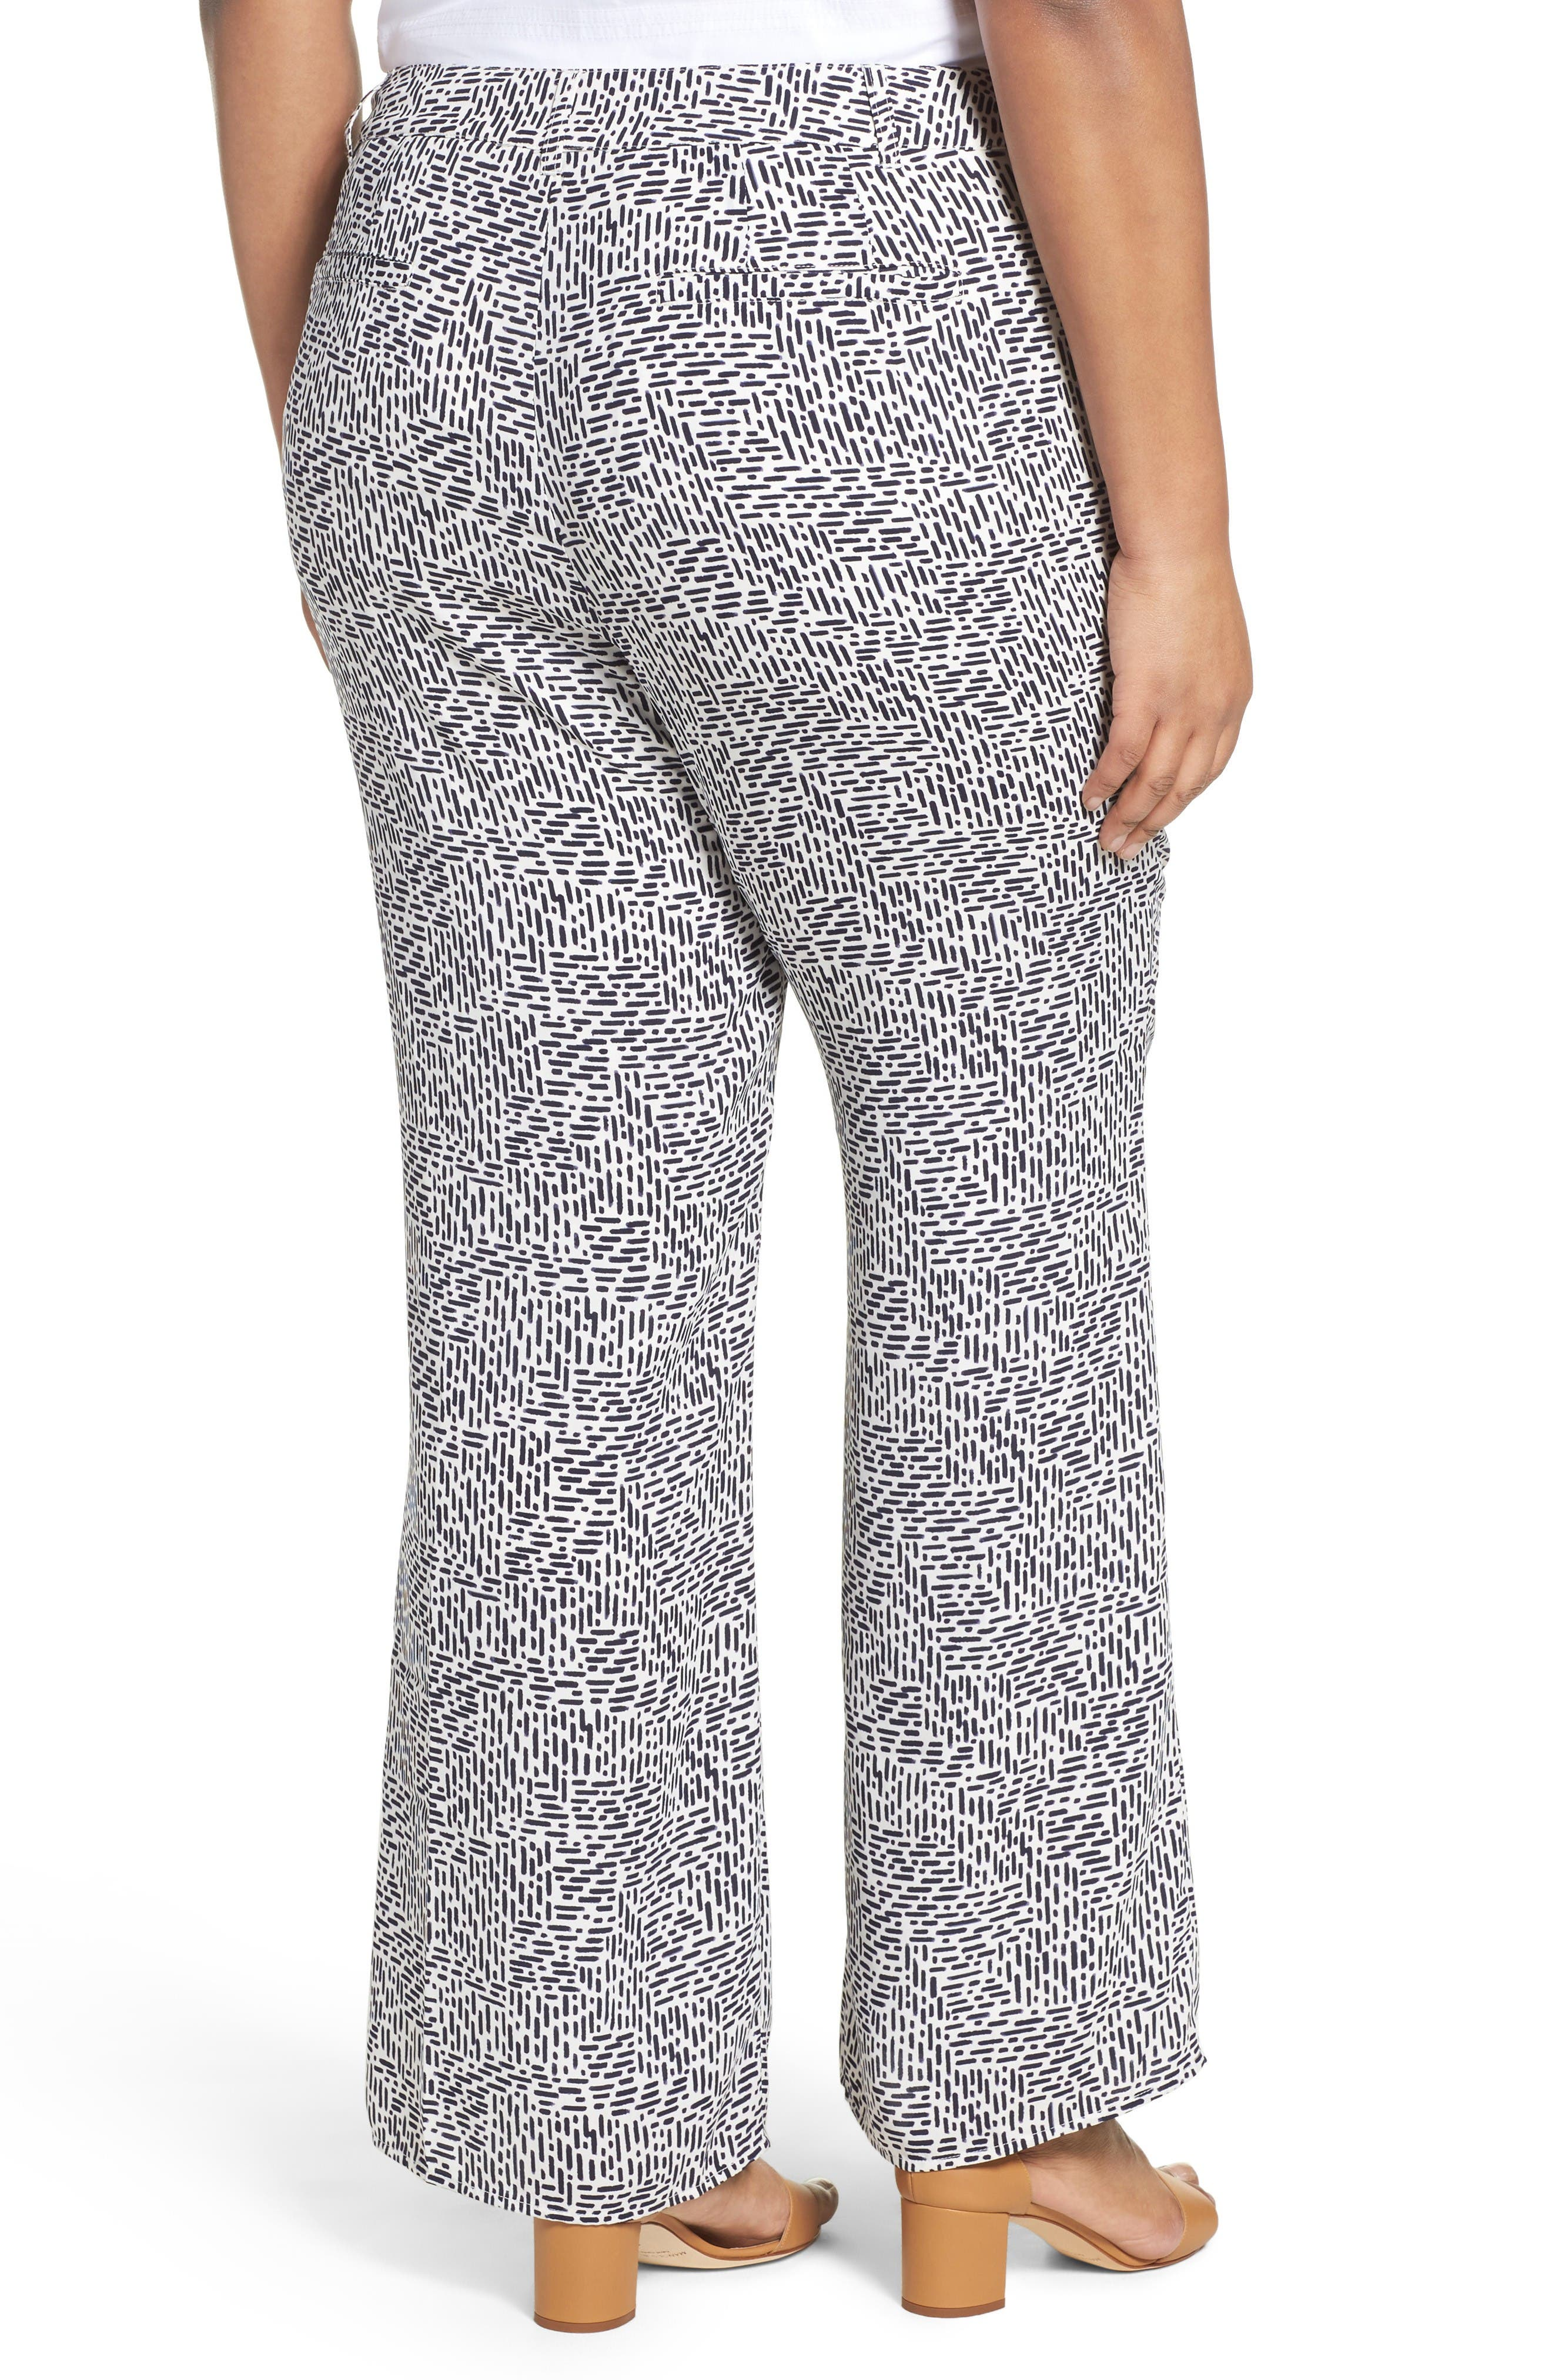 Dots & Dashes Flare Leg Pants,                             Alternate thumbnail 2, color,                             White/ Navy